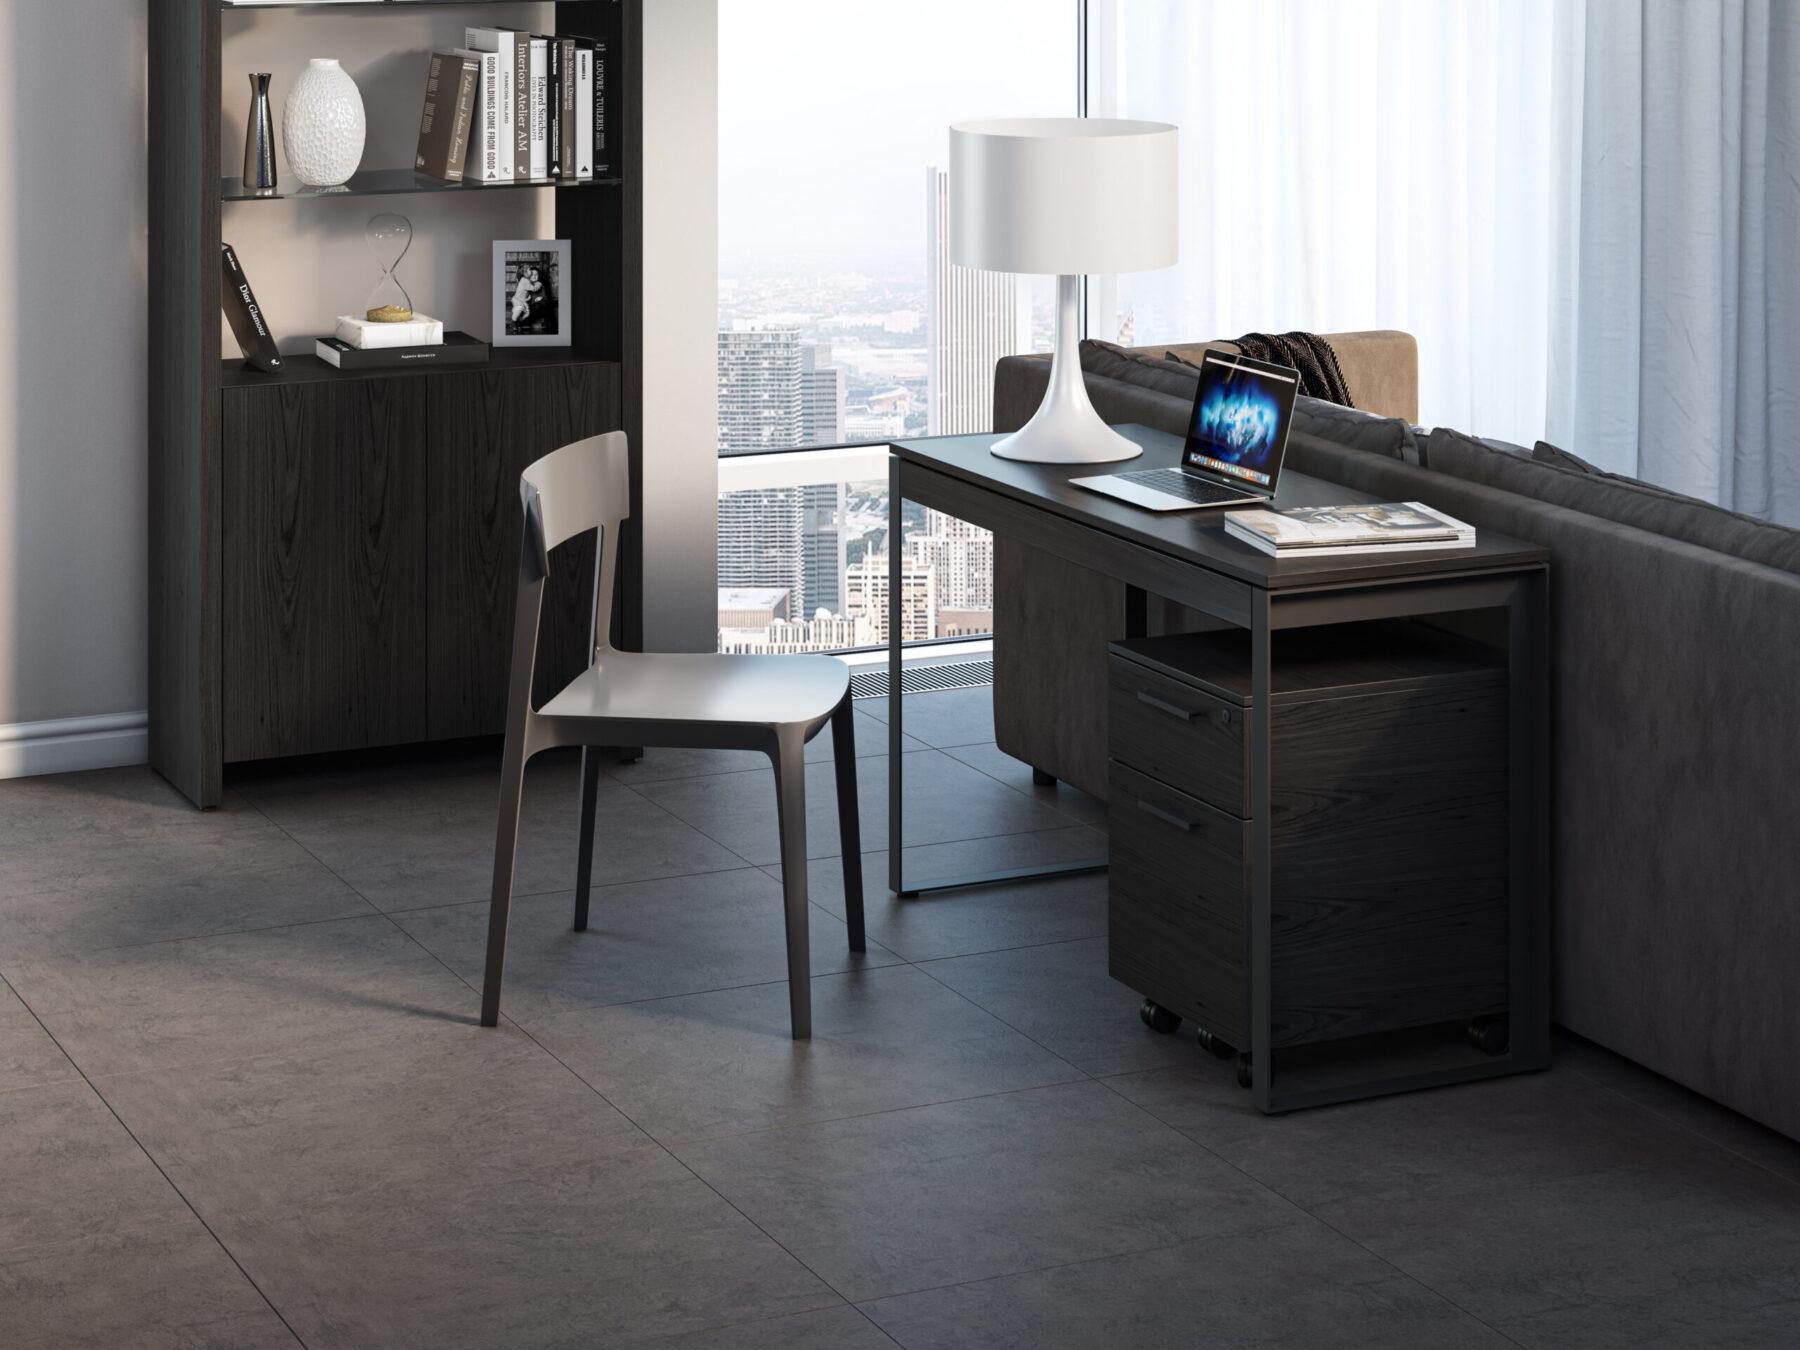 Linea-Console-6222-BDI-Modern-Slim-Desk-Behind-Sofa-CRL